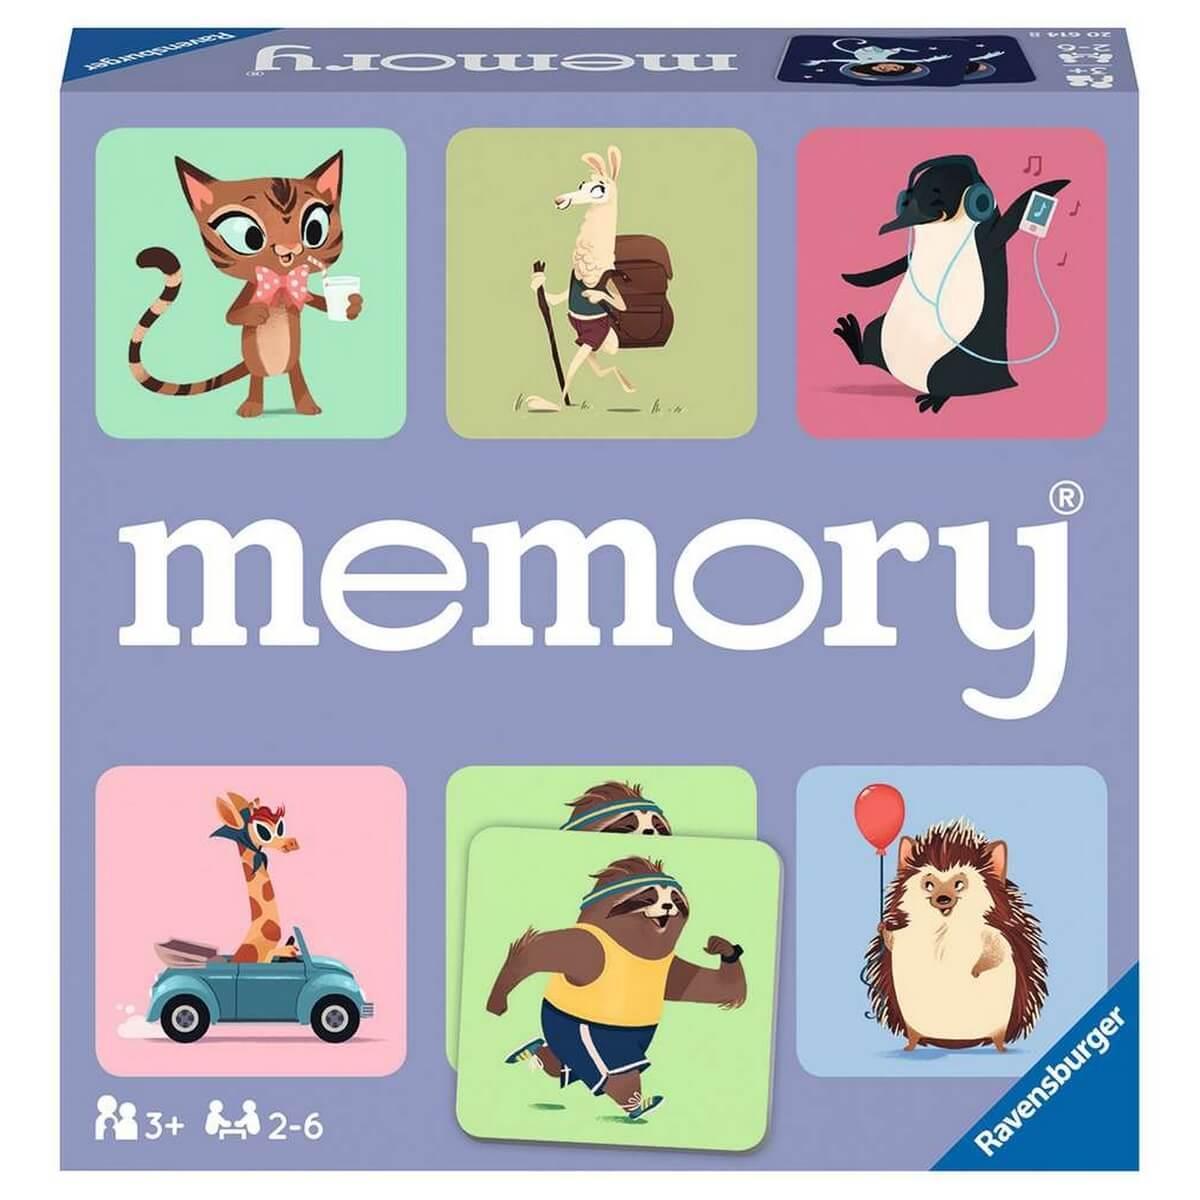 Jeu Grand memory : Le monde sauvage des animaux